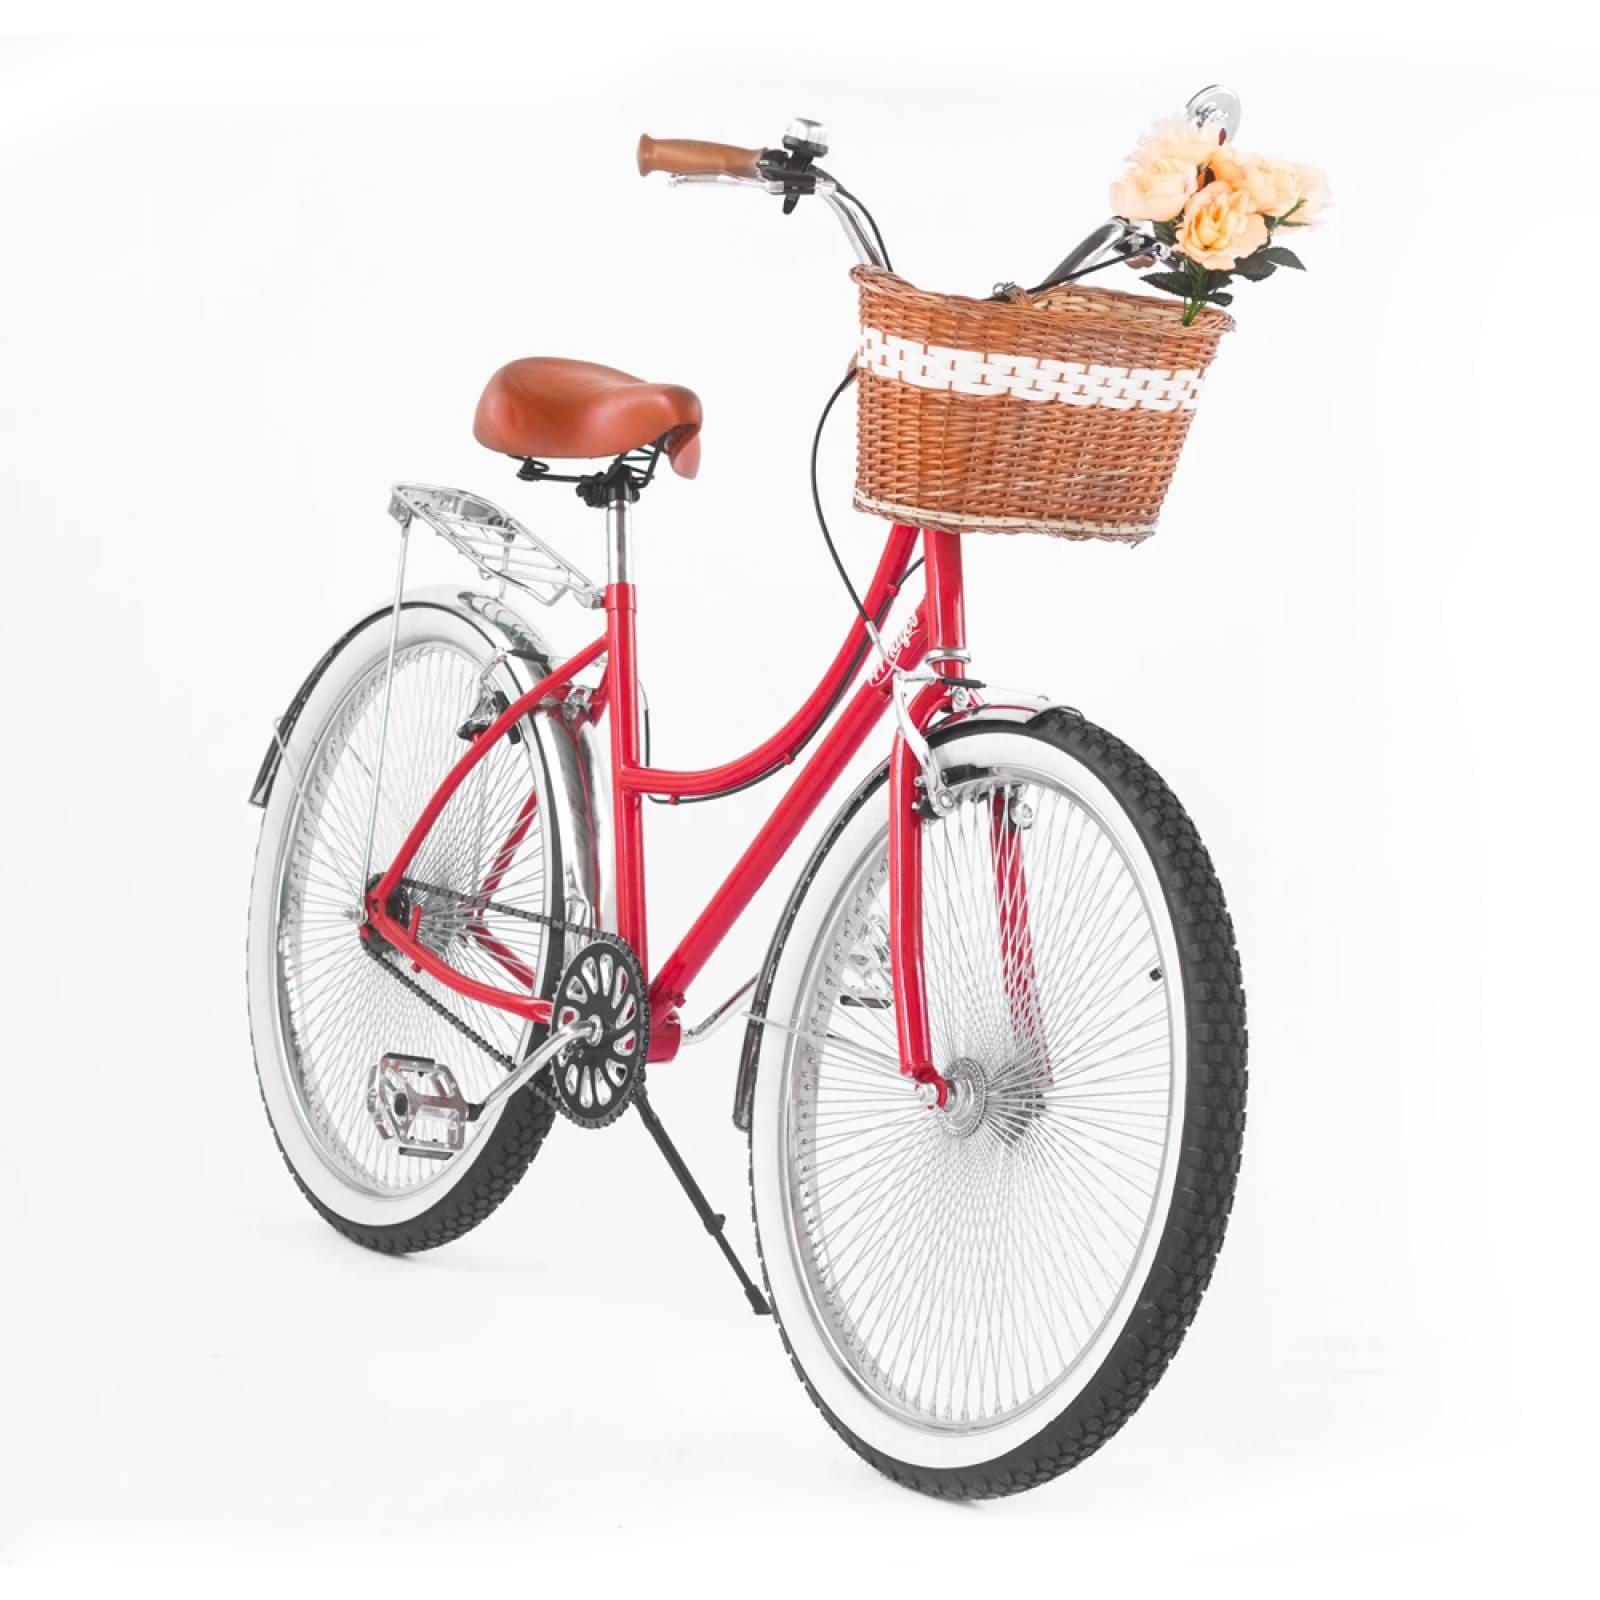 Bici Inglesa144 R-26 Portabultos Salpicadera Manubrio Gaviota 144 Rayos Bikes